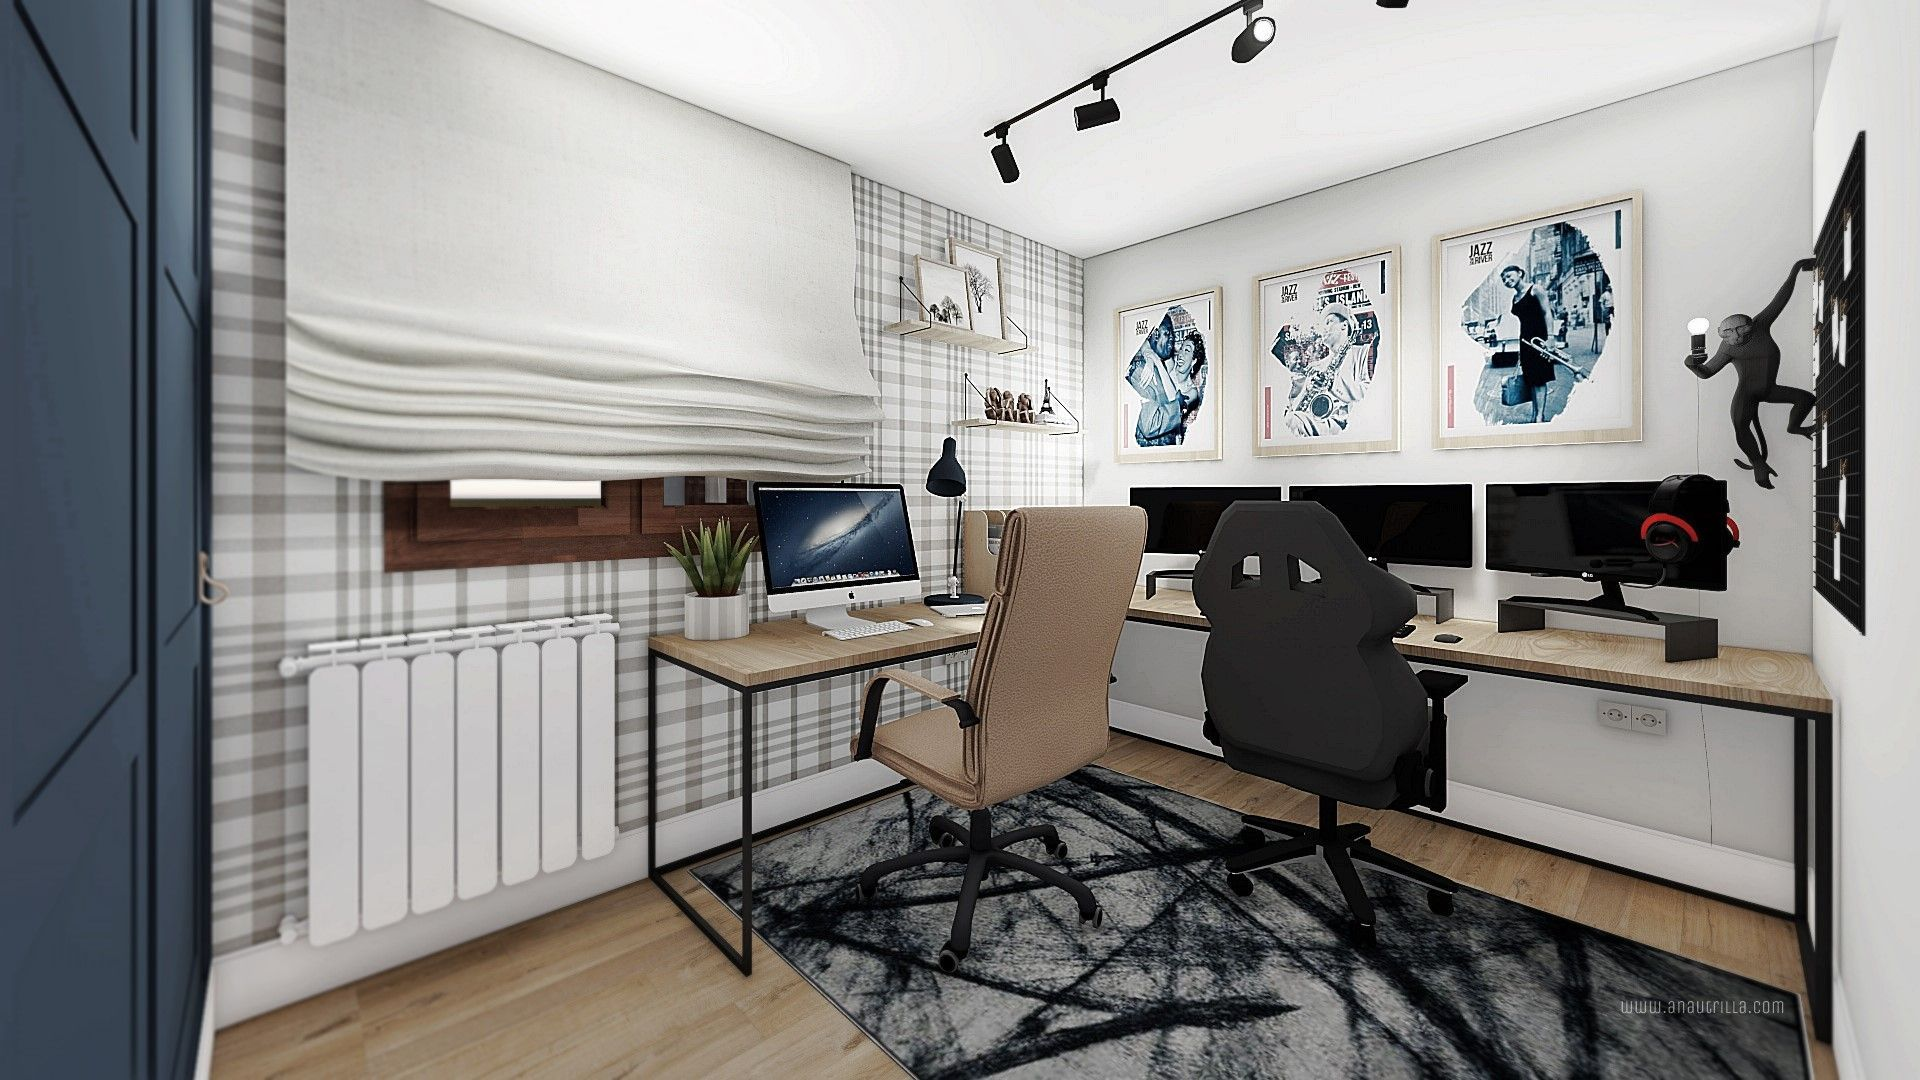 Zona de despacho para gamer, proyecto de diseño e interiorismo 3D. reforma integral en Valladolid @Utrillanais